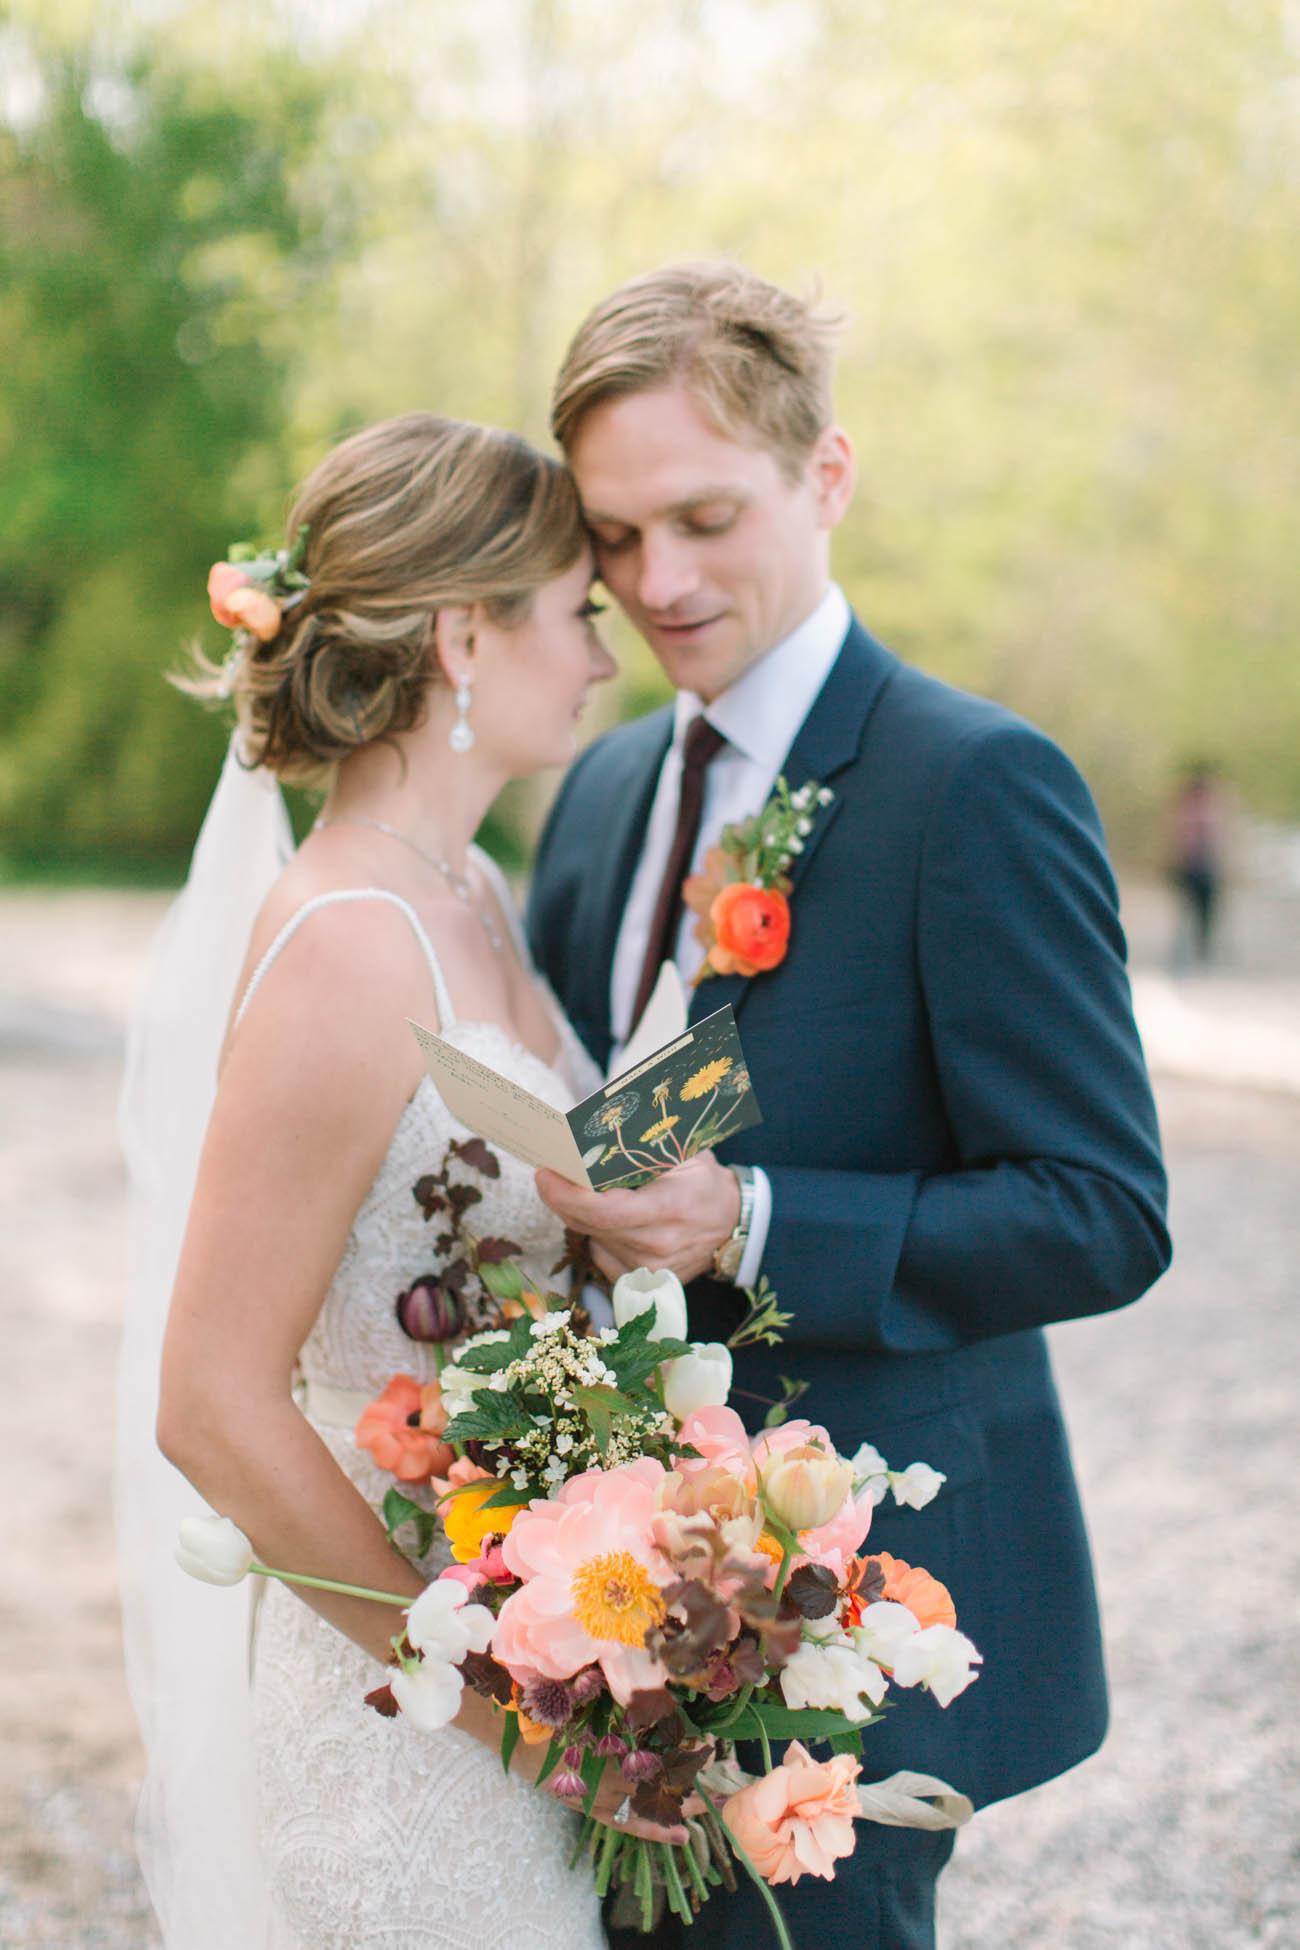 kateweinsteinphoto_schlitz_audubon_milwaukee_wedding-154.jpg